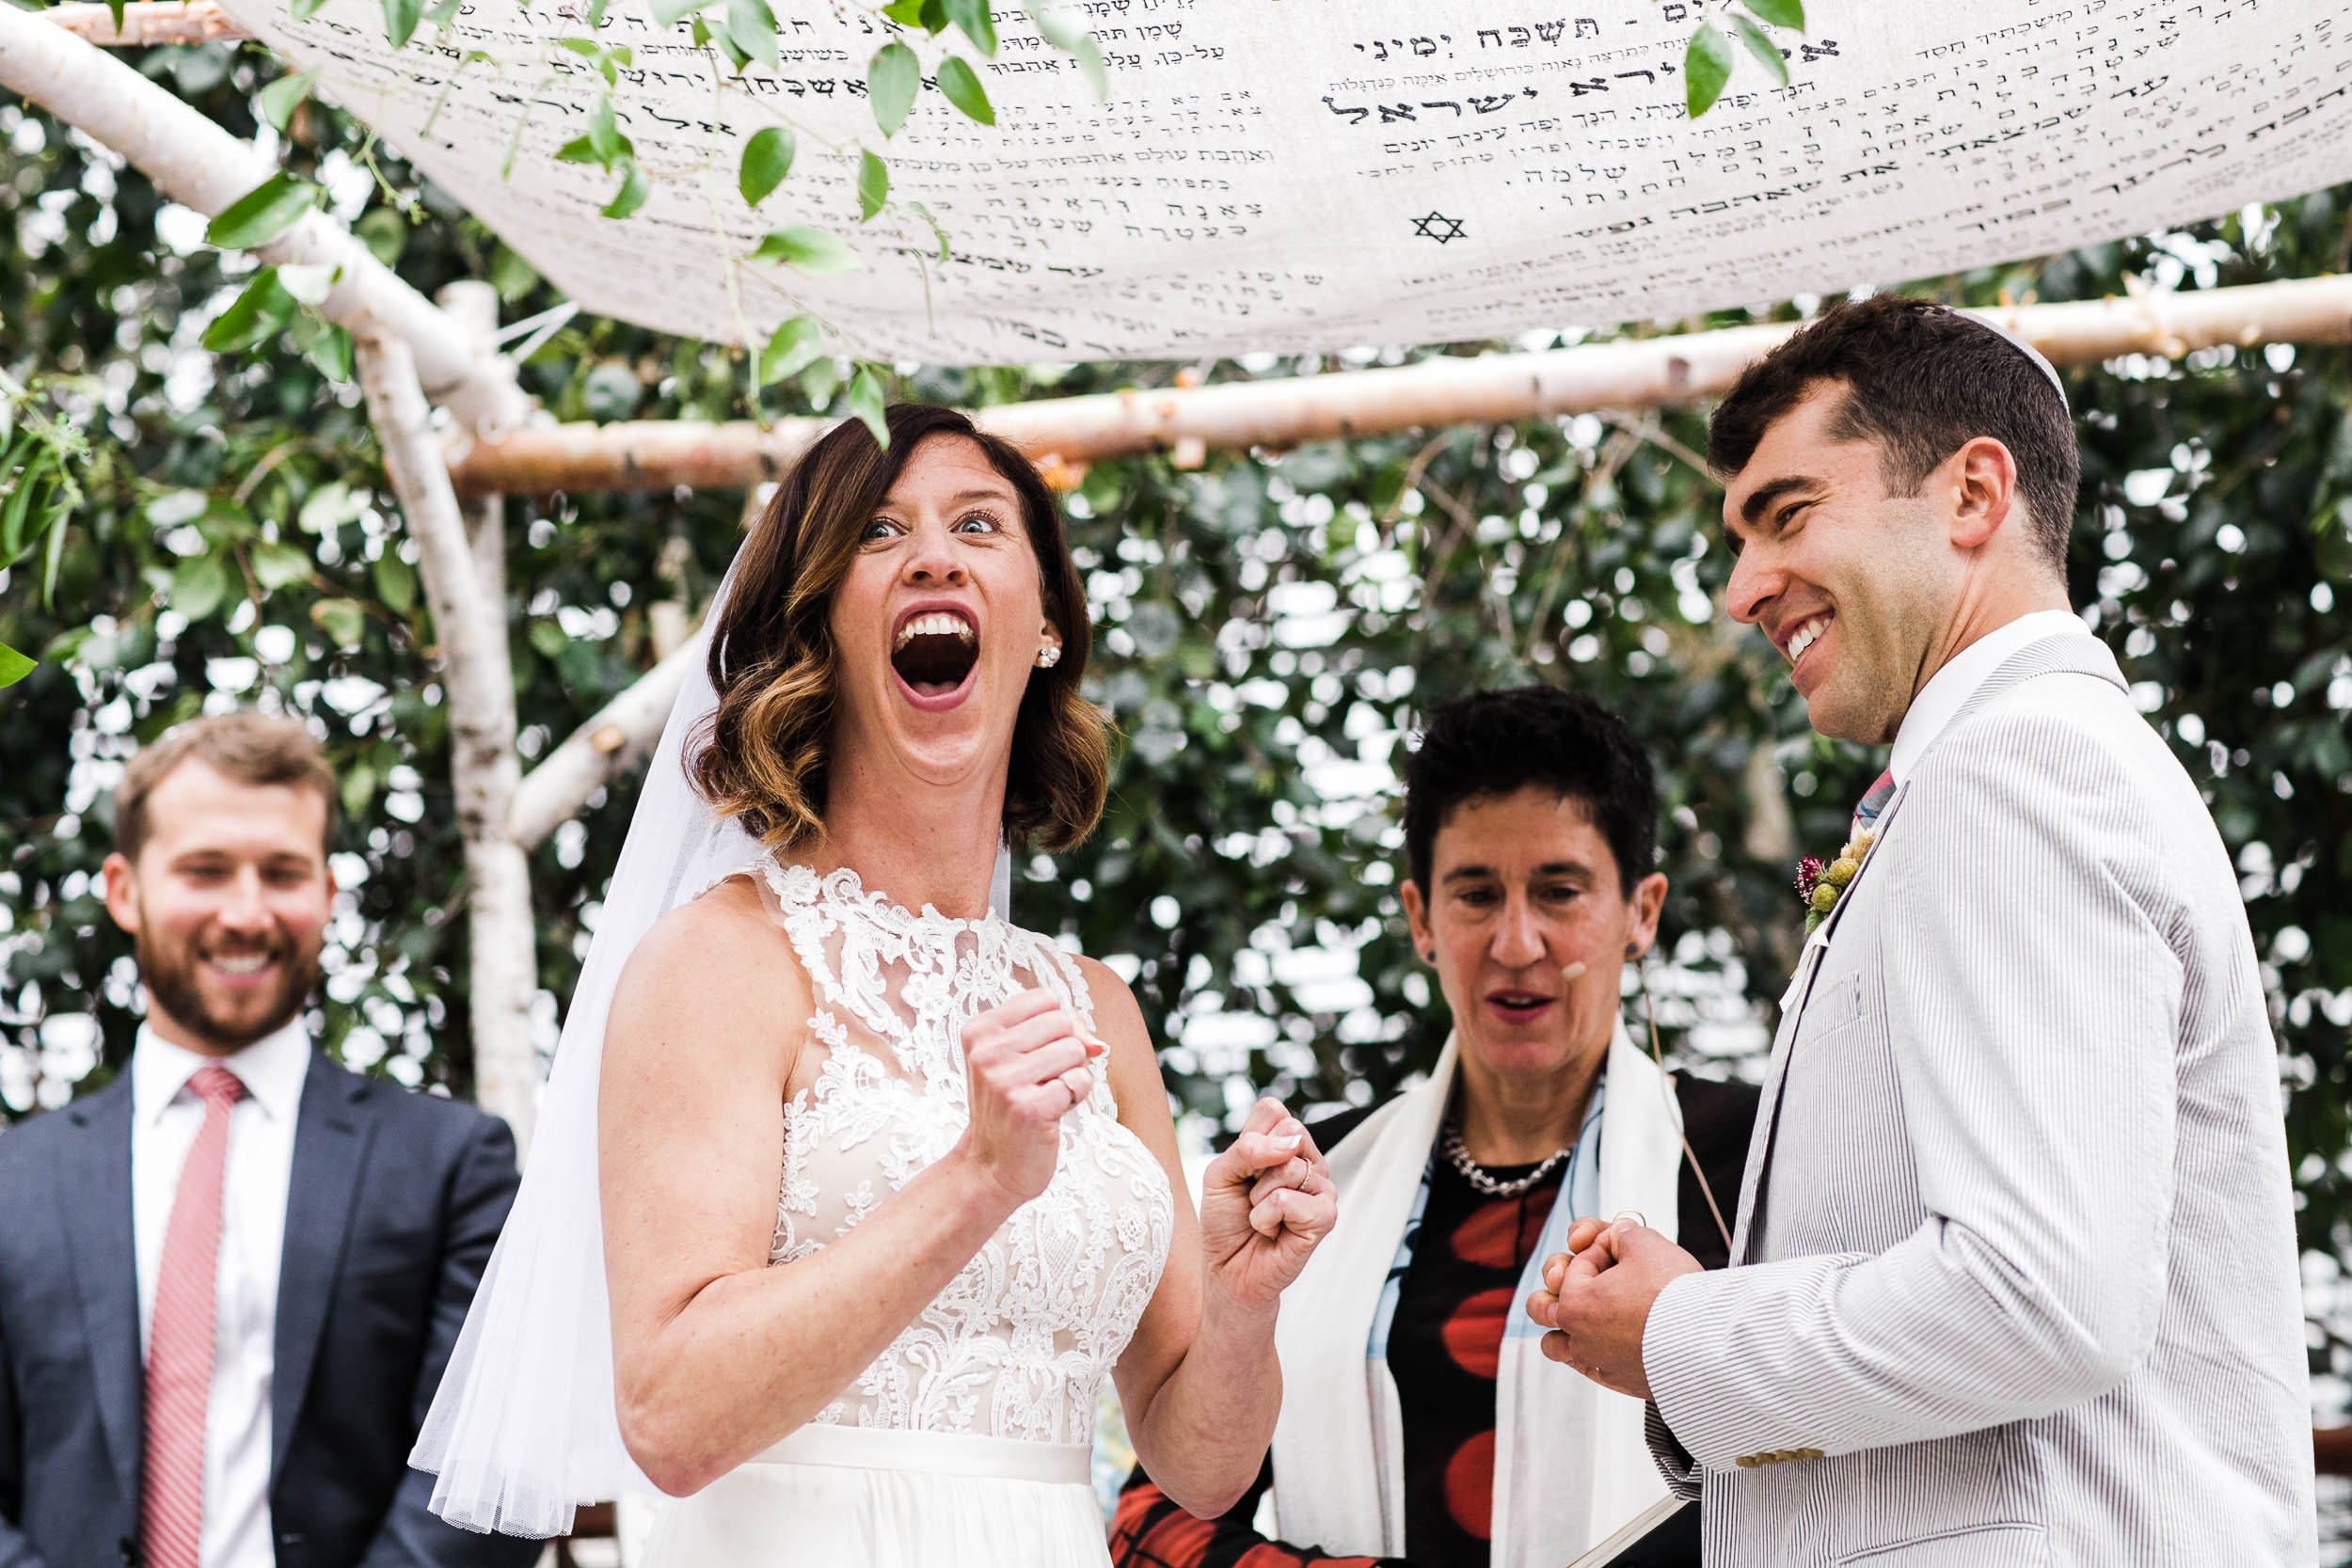 081818_Alina Jason San Francisco Wedding_Buena Lane Photography_1322 copy.jpg